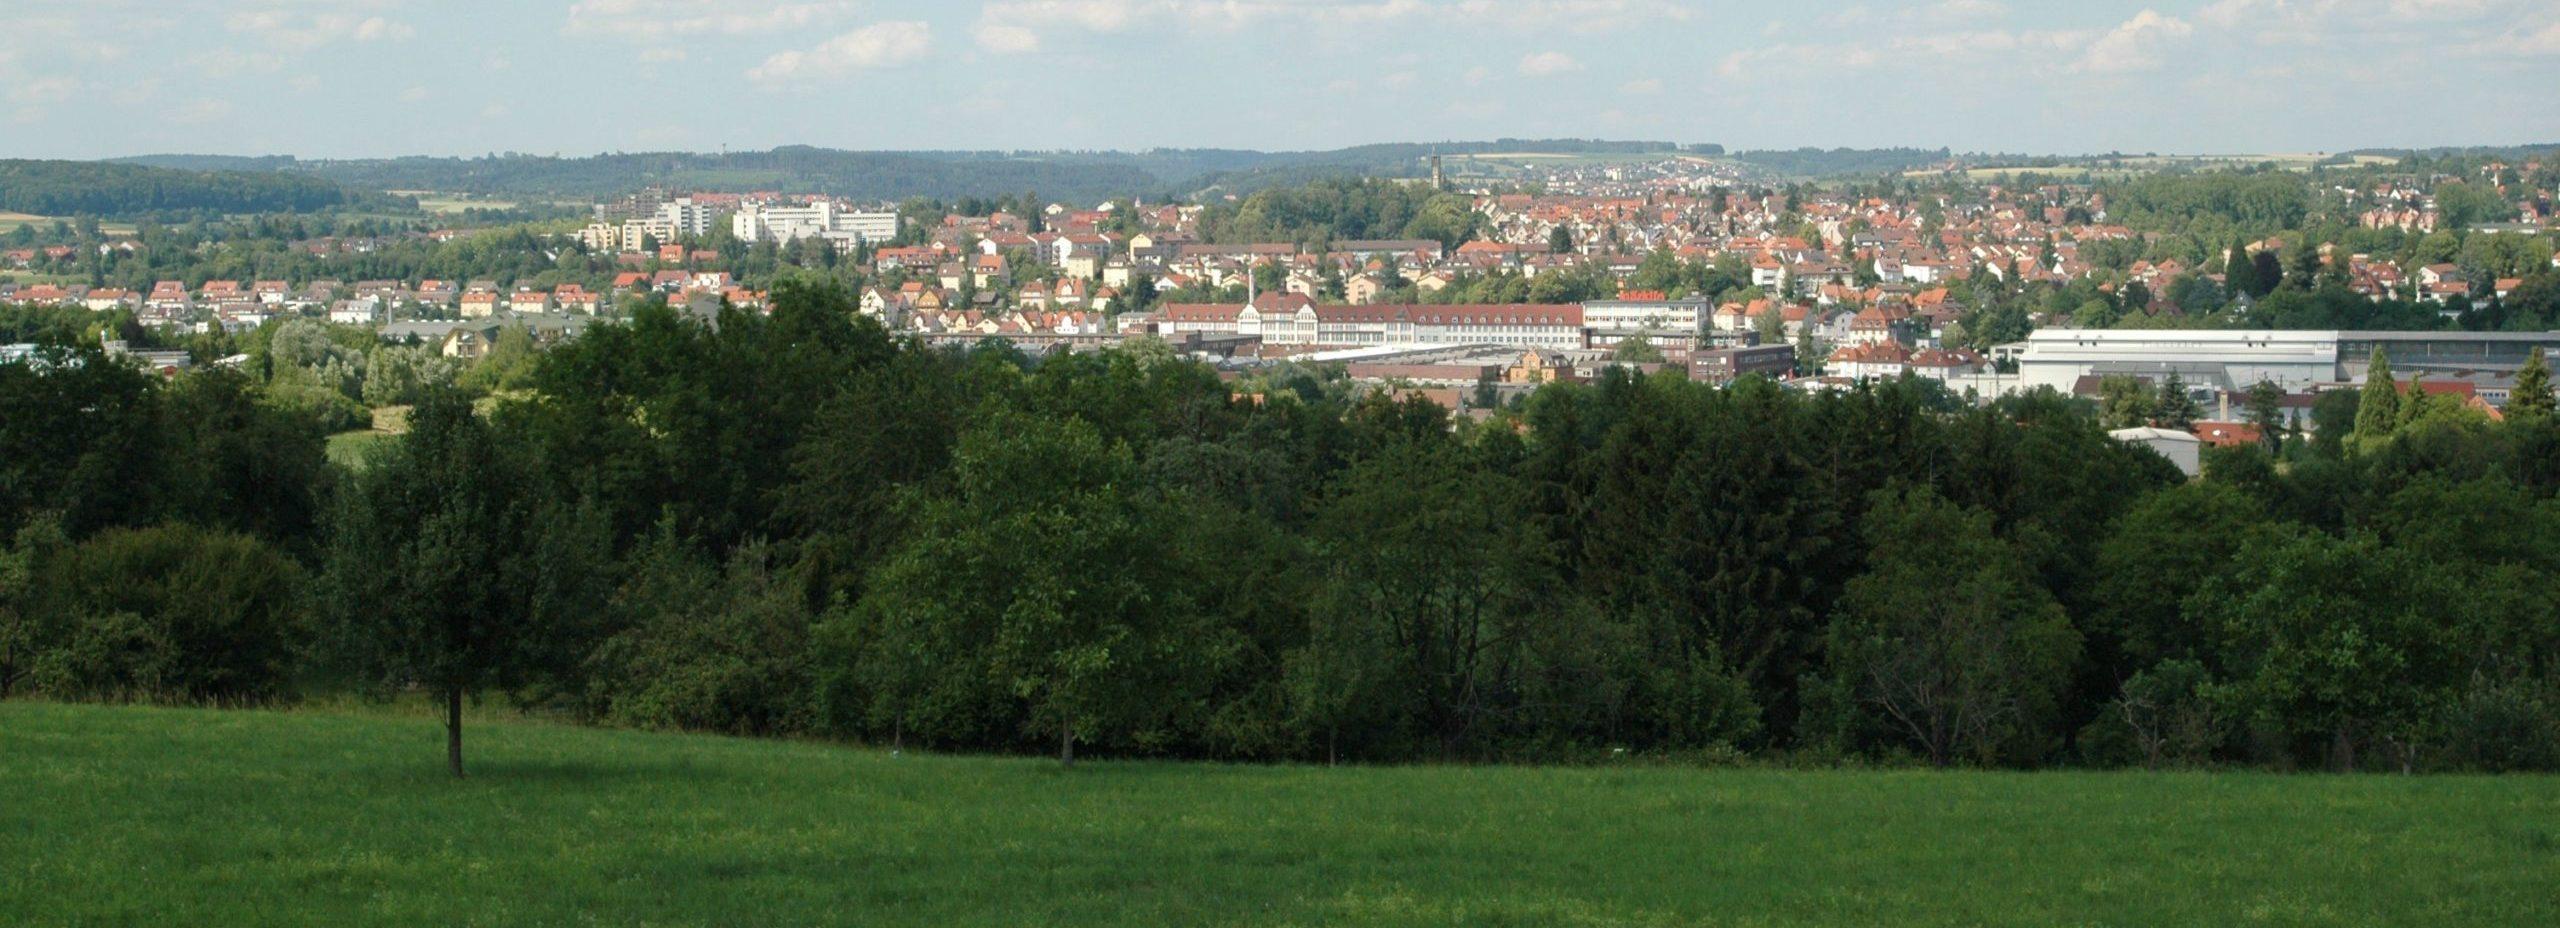 fröhliches Kinderschminken in Göppingen in Baden-Württemberg